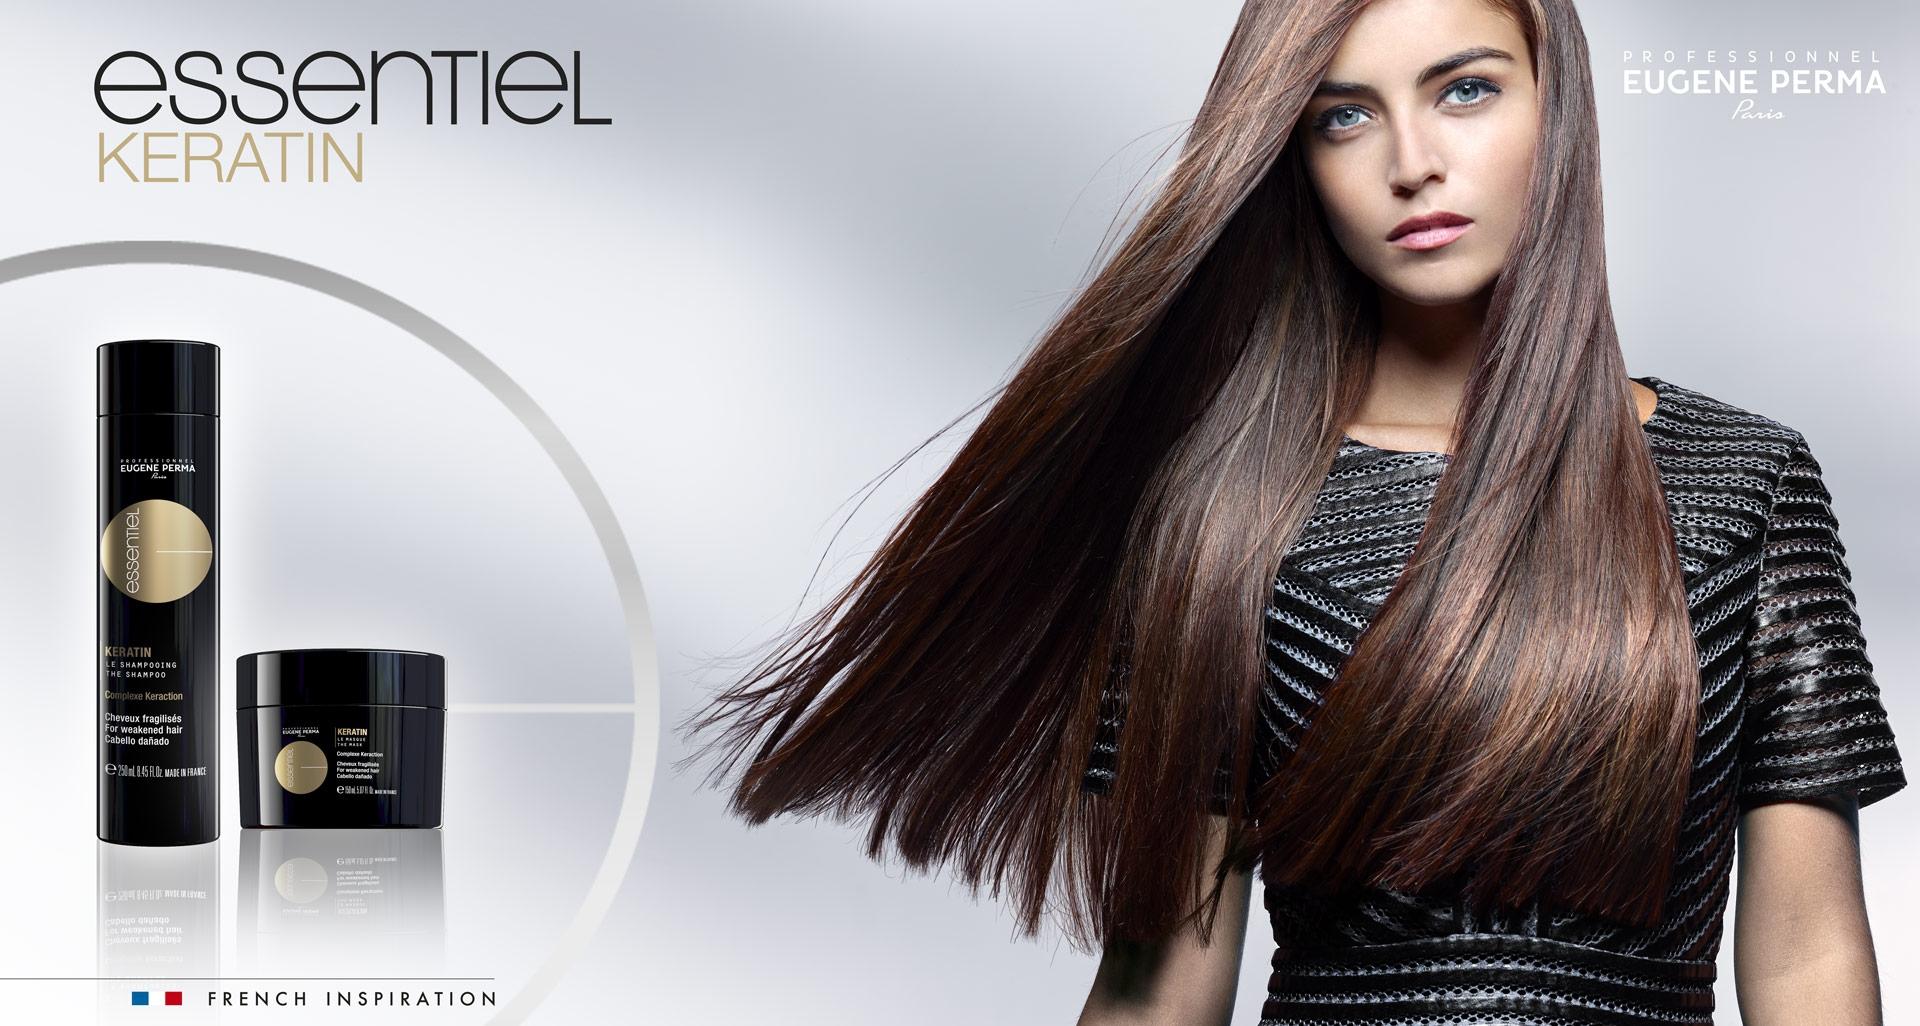 frederic mercier fashion photographer one color eugene perma hair beauty cosmetic make up cheveux beauty cosmetique coloration carmen solaris yzae olaplex essentiel artist petrol hahn